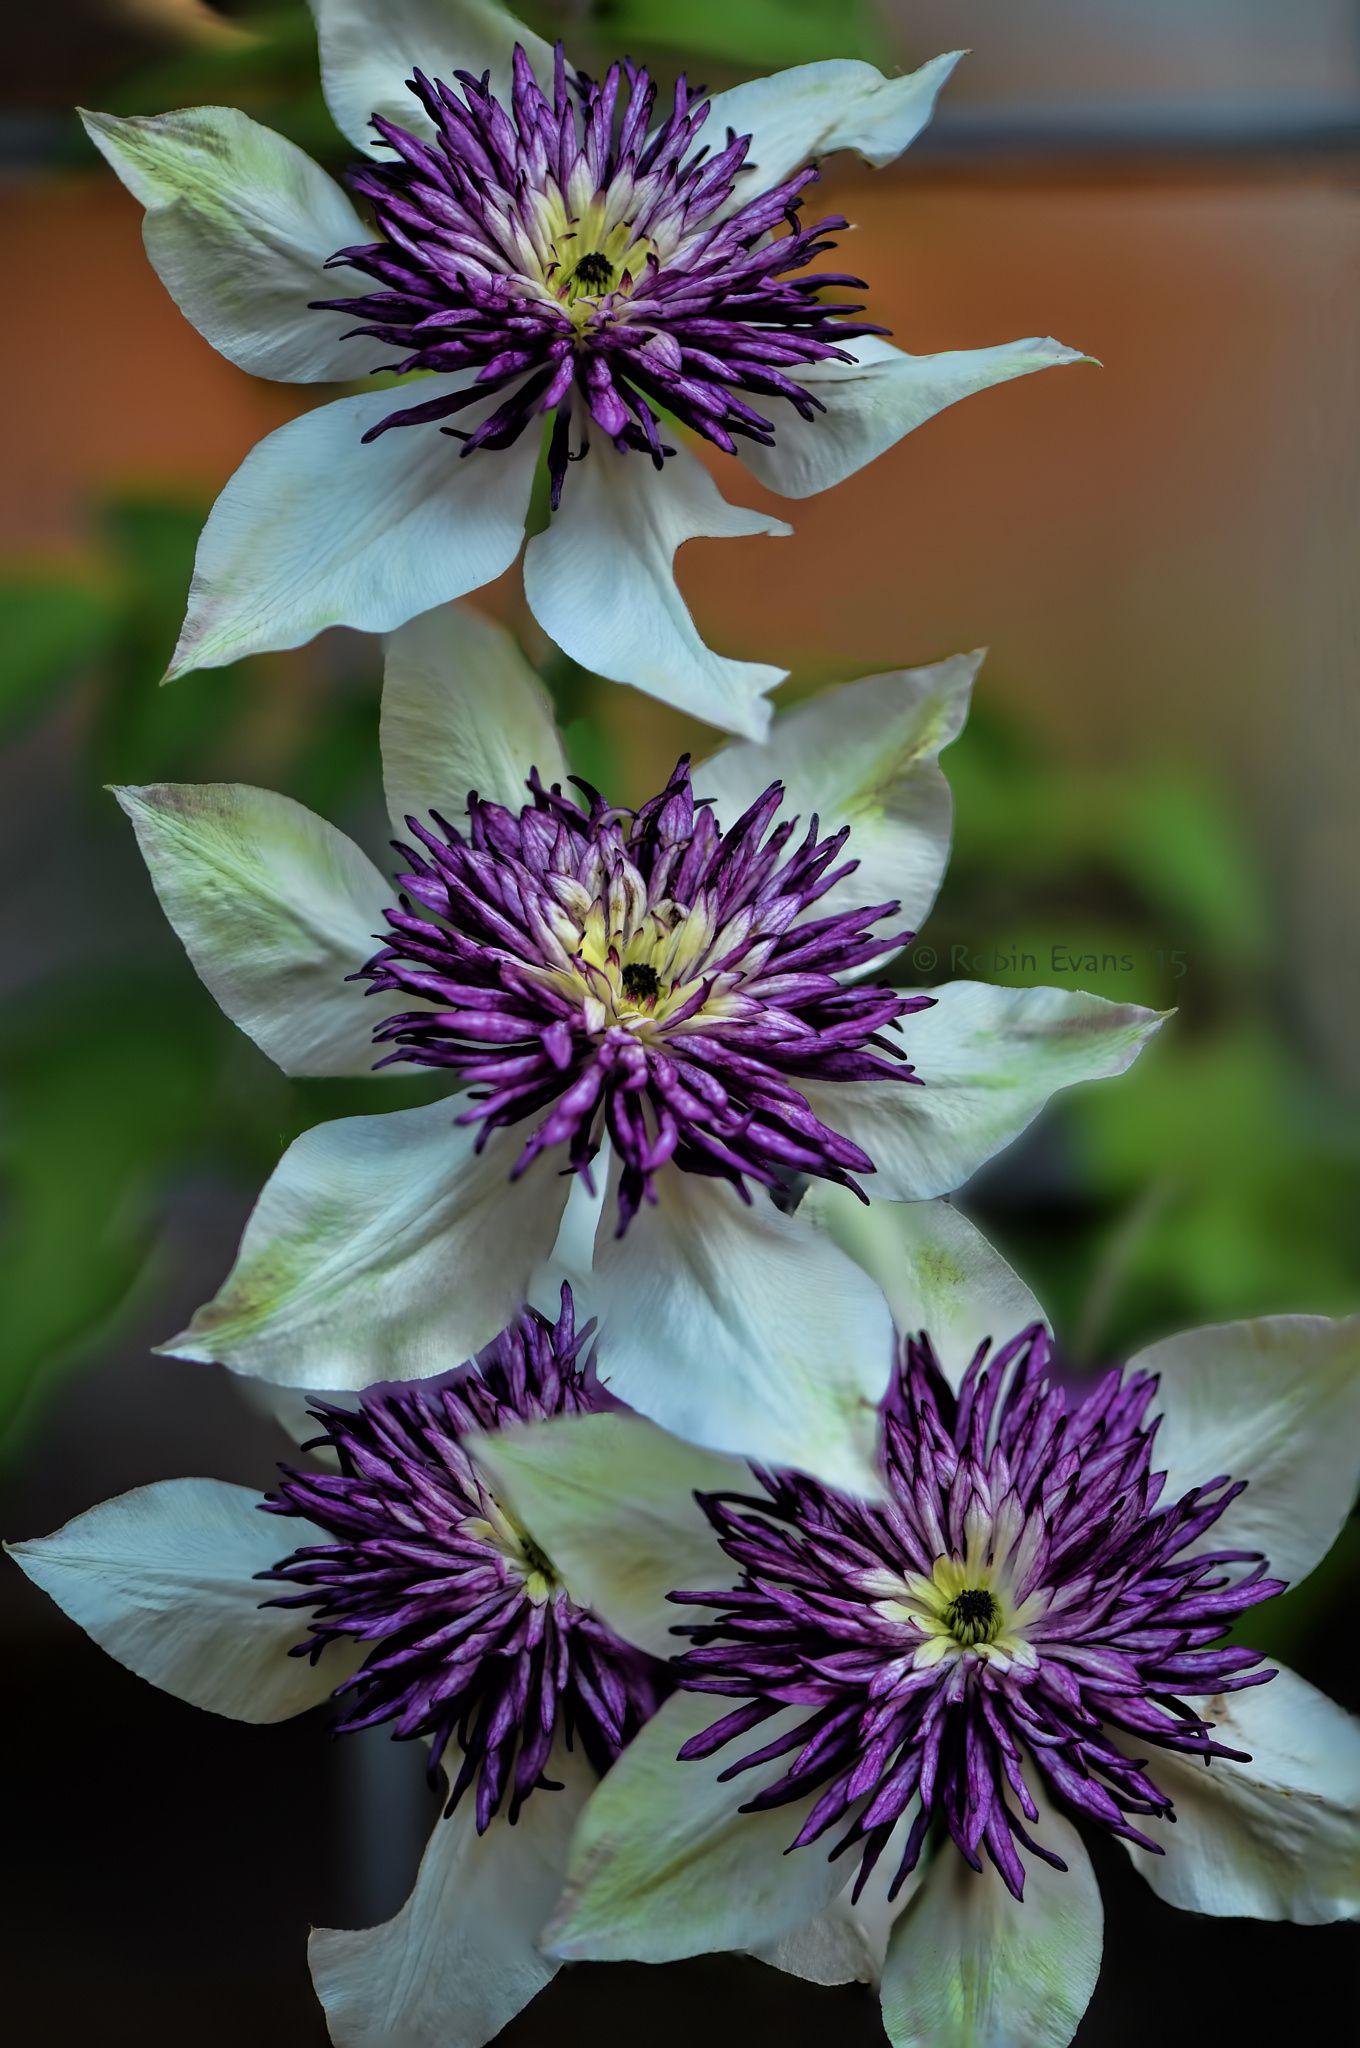 Florida sieboldii clematis Çiçekler flowers pinterest